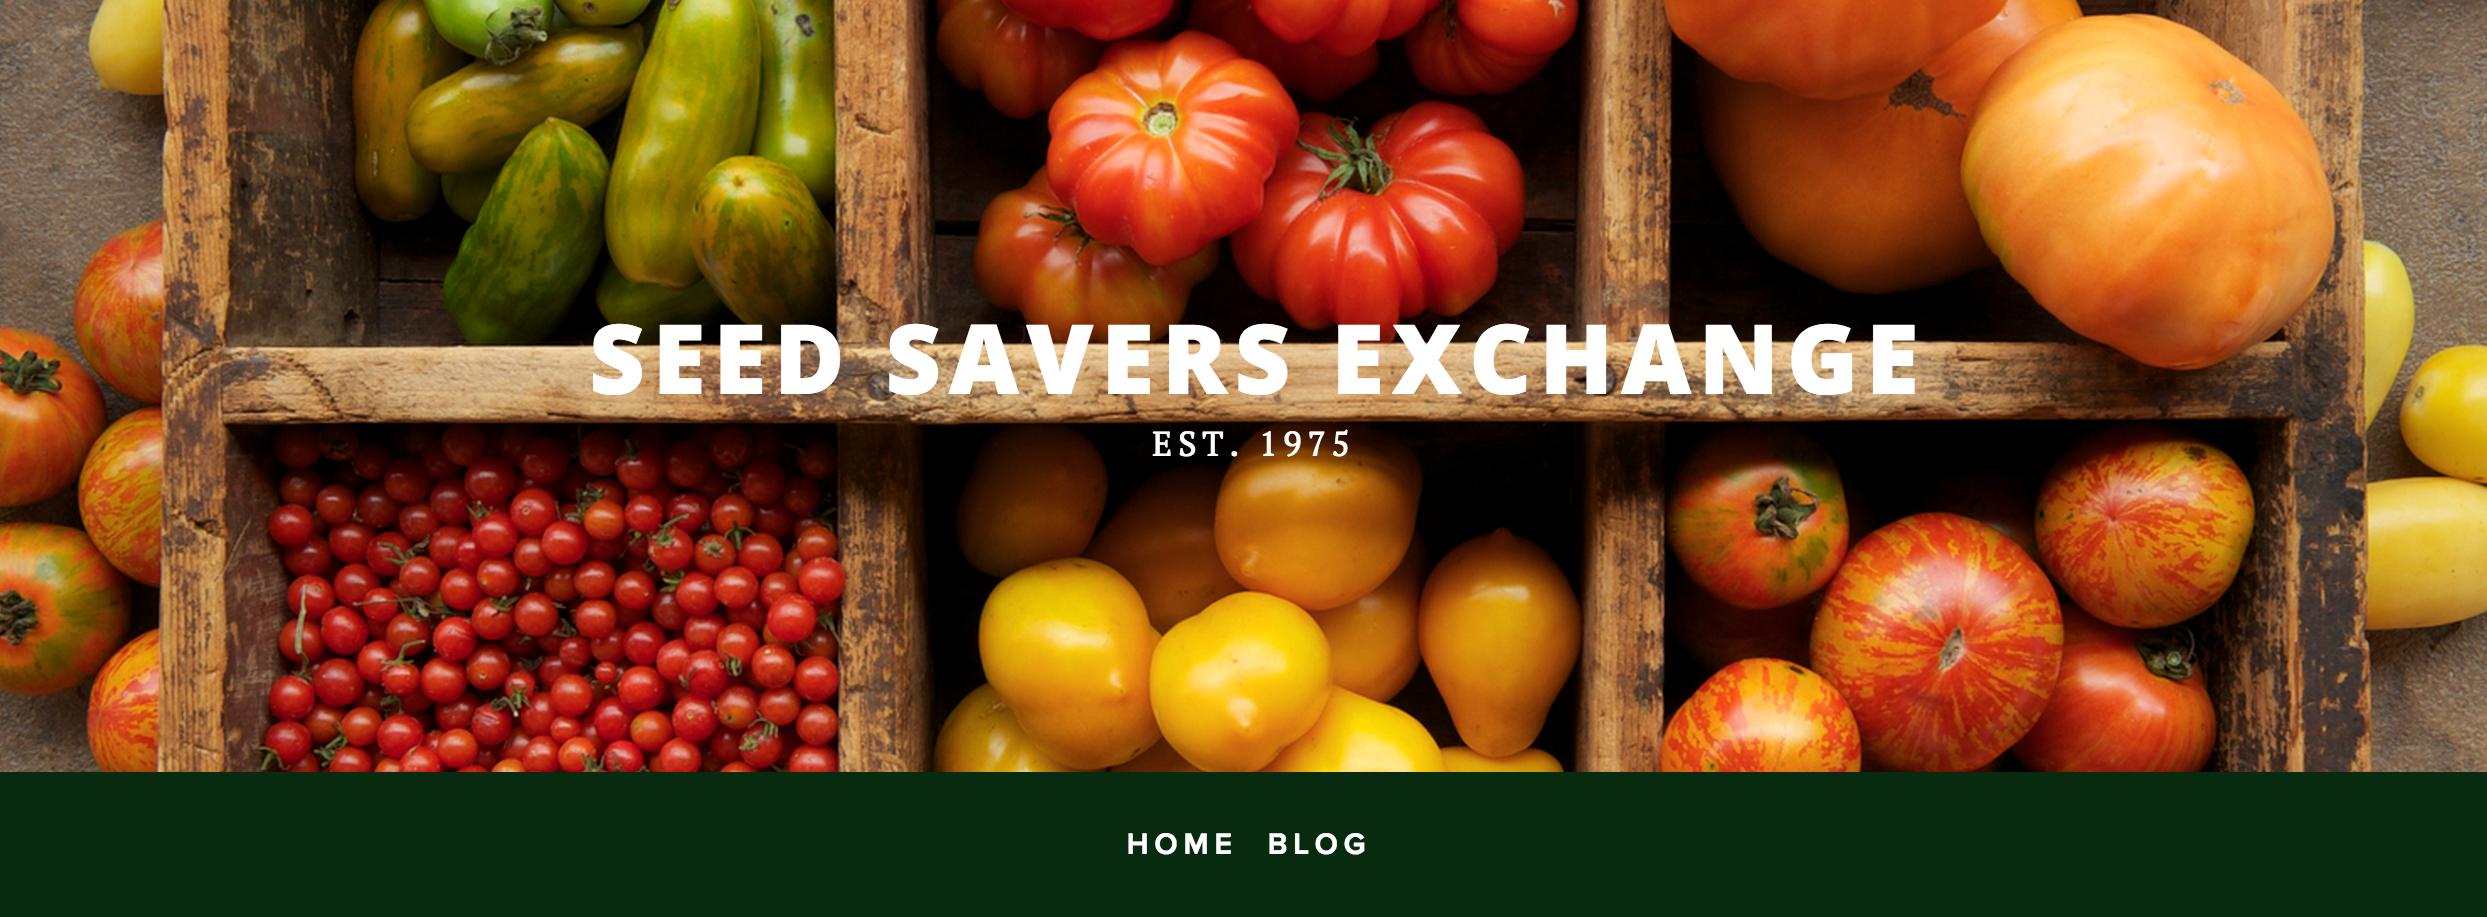 Seed Savers Exchange Via Porch